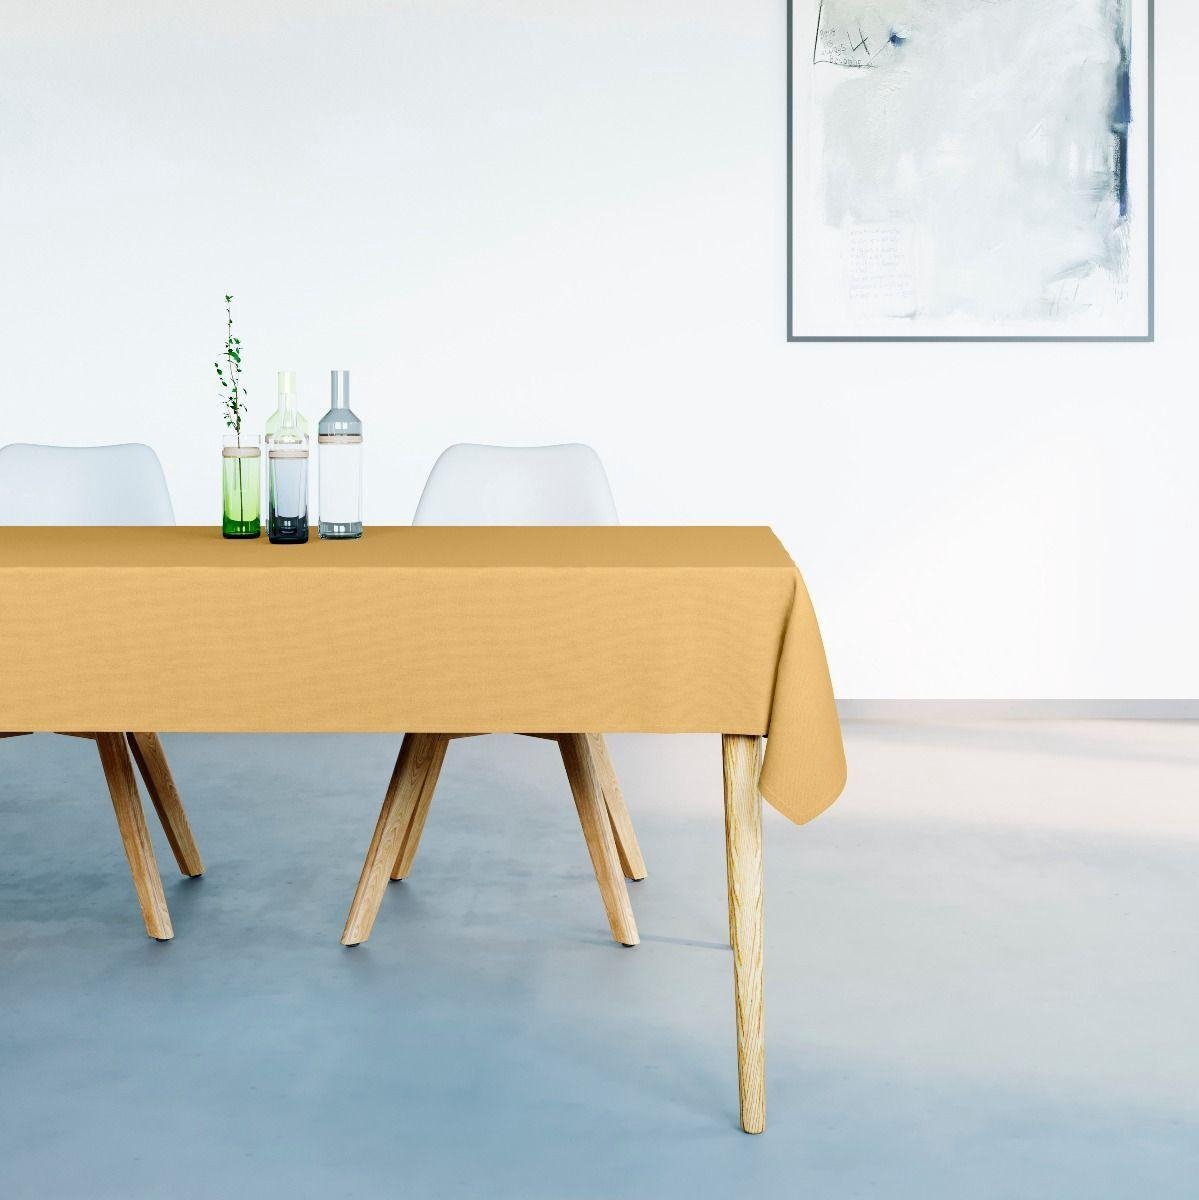 Mistral Home - Tafelkleed waterafstotend - 150x250 cm - Mosterd Geel - Mistral Home